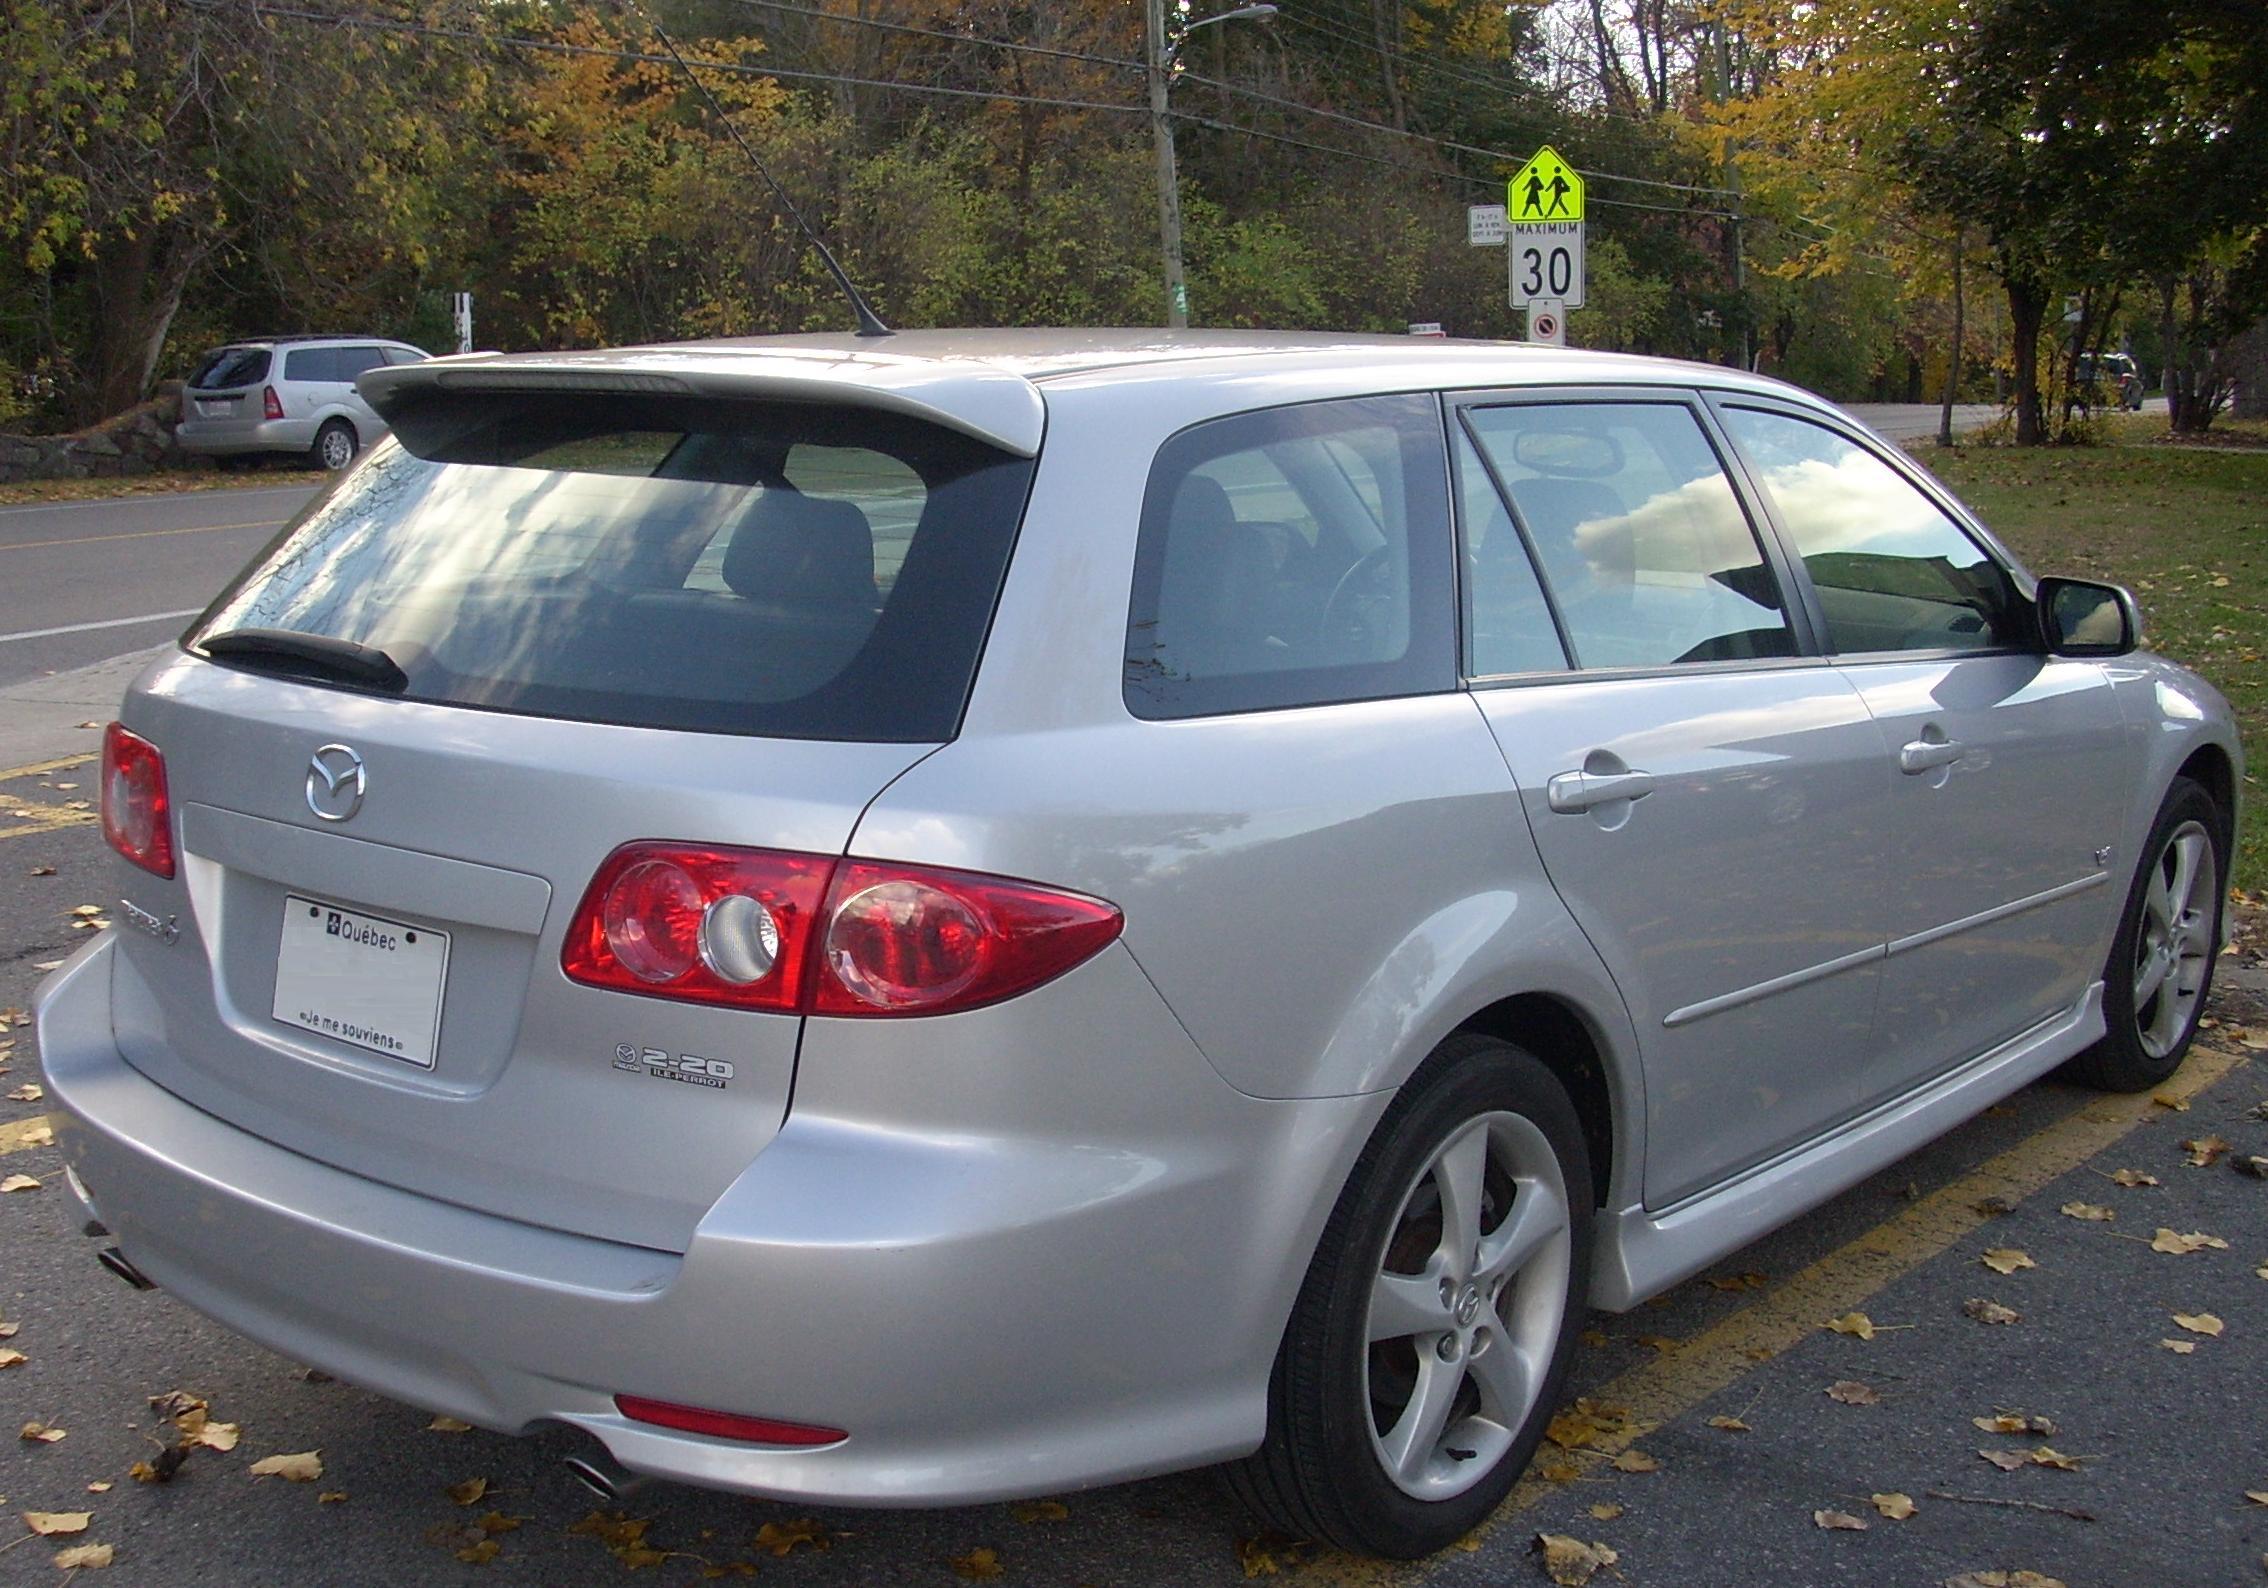 https://upload.wikimedia.org/wikipedia/commons/d/d6/%2703-%2705_Mazda_6_Wagon_V6.jpg